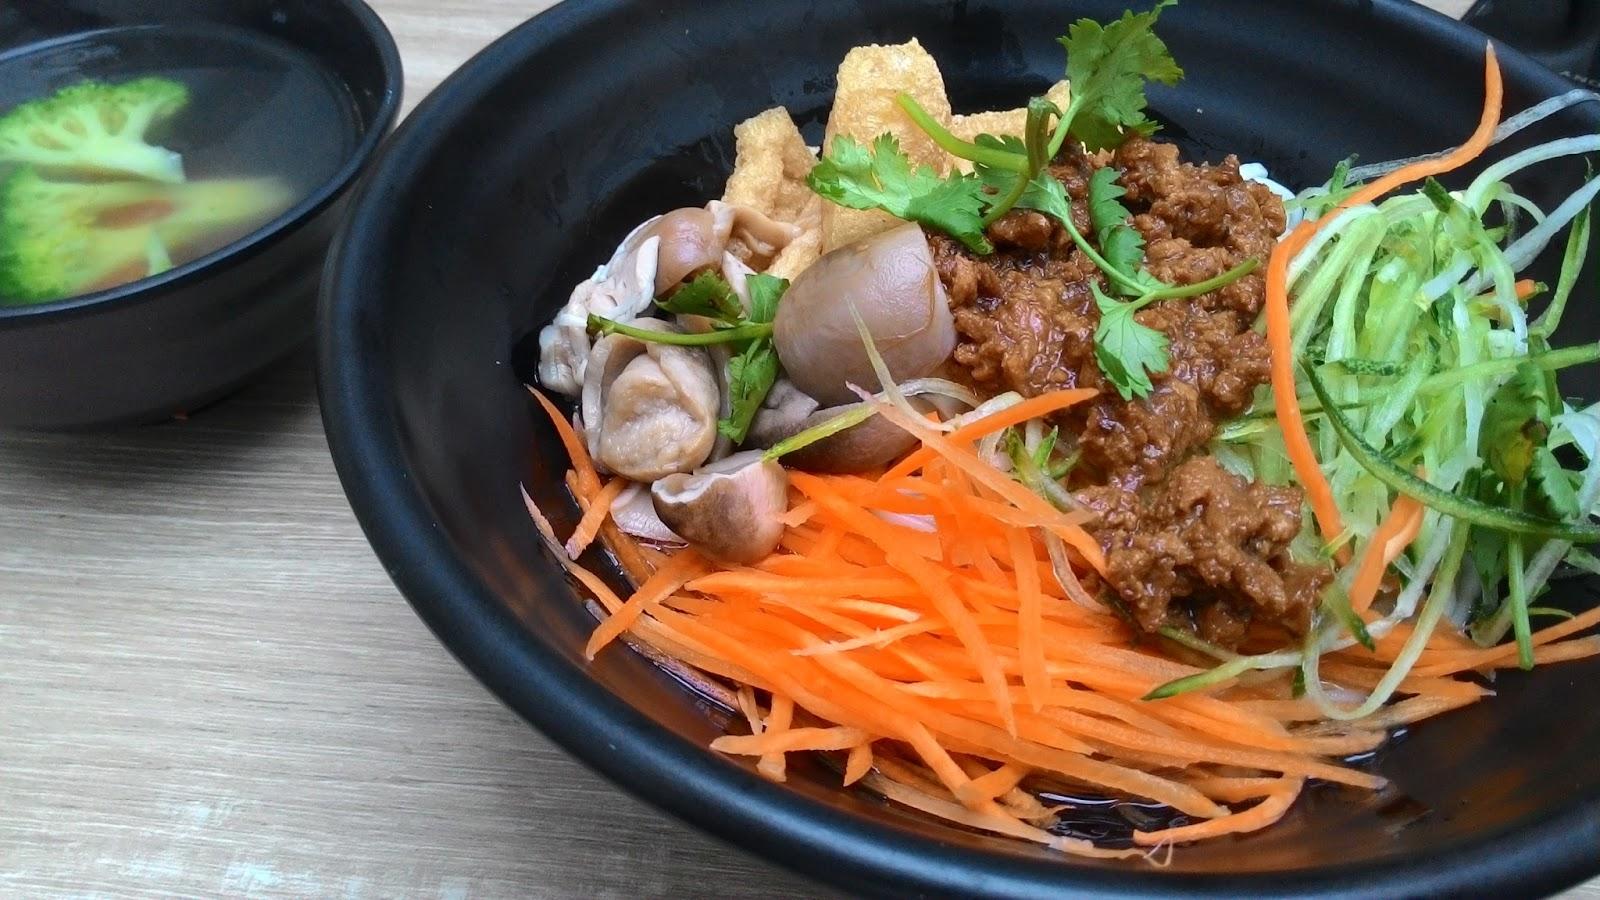 Chic vegetarian cuisine lighter meals healthier green - Green vegetarian cuisine ...